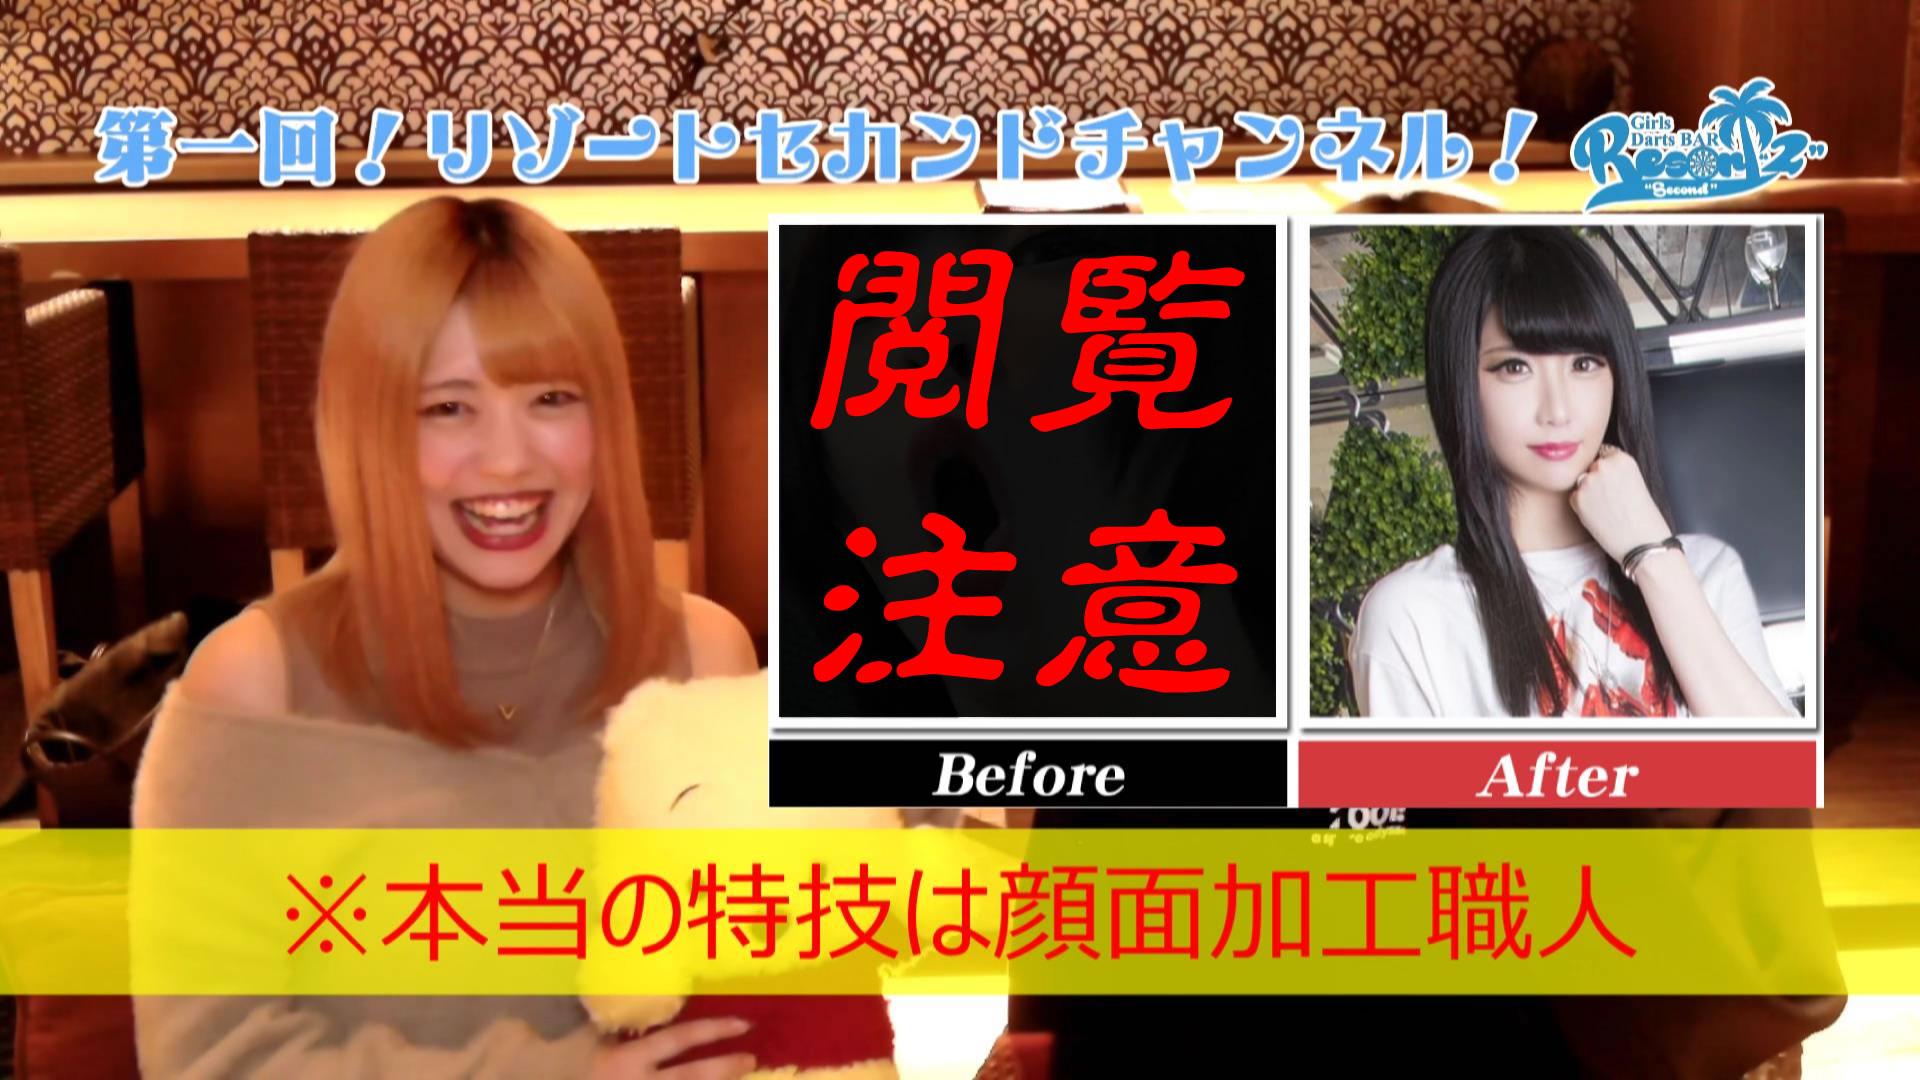 【YouTube】リゾートセカンドチャンネル開設